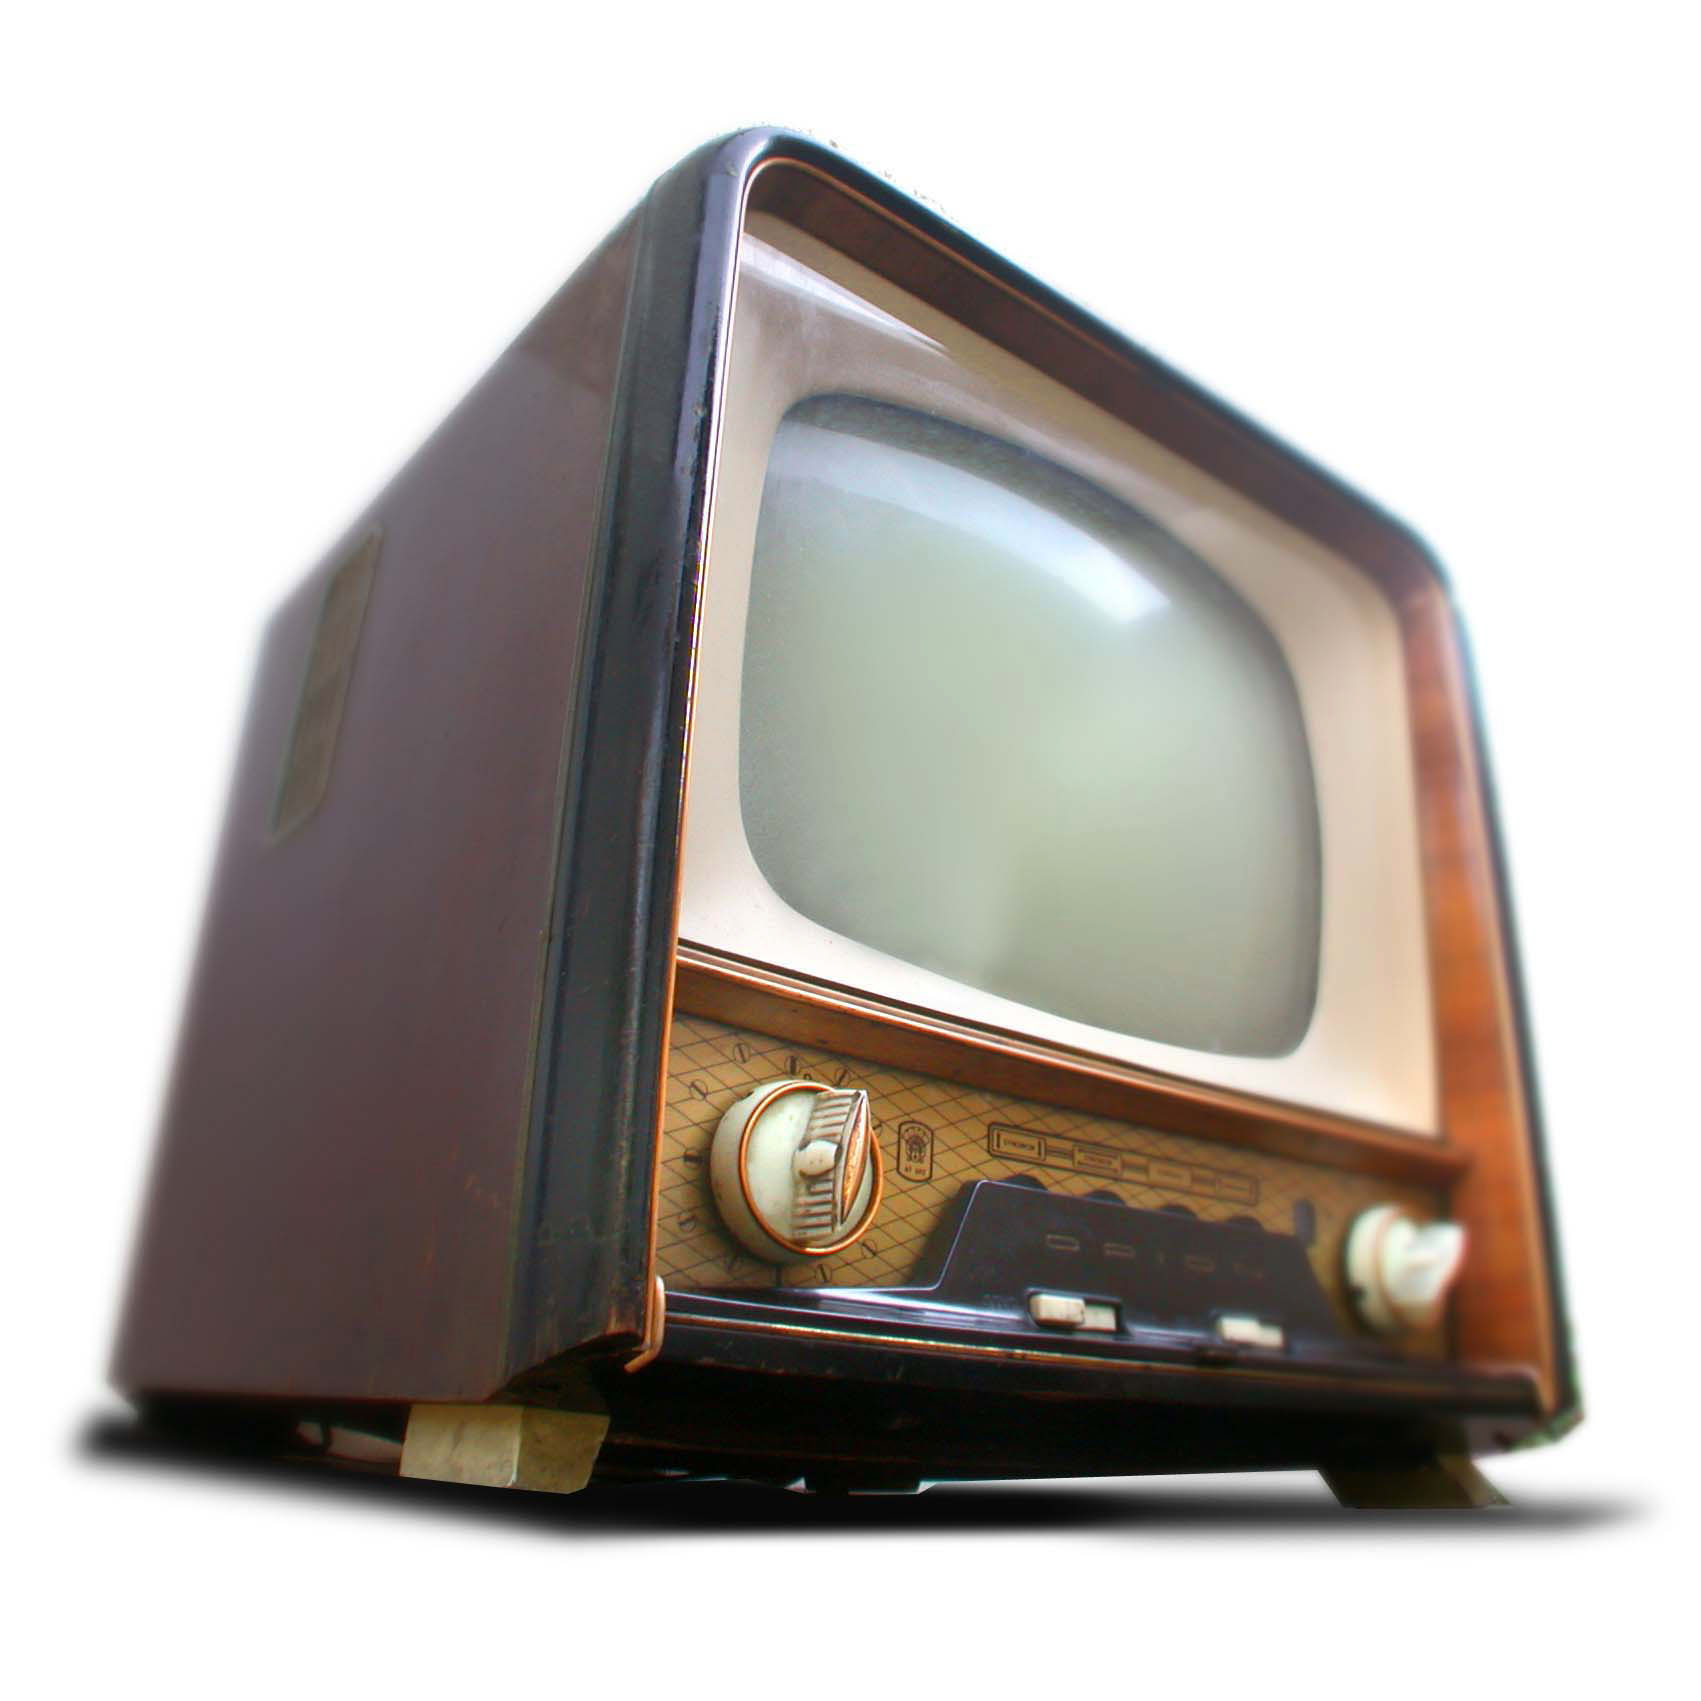 Program telewizyjny dla historyków (17 lipca 2013)  HISTORIAorgpl  histo -> Pose Télévision